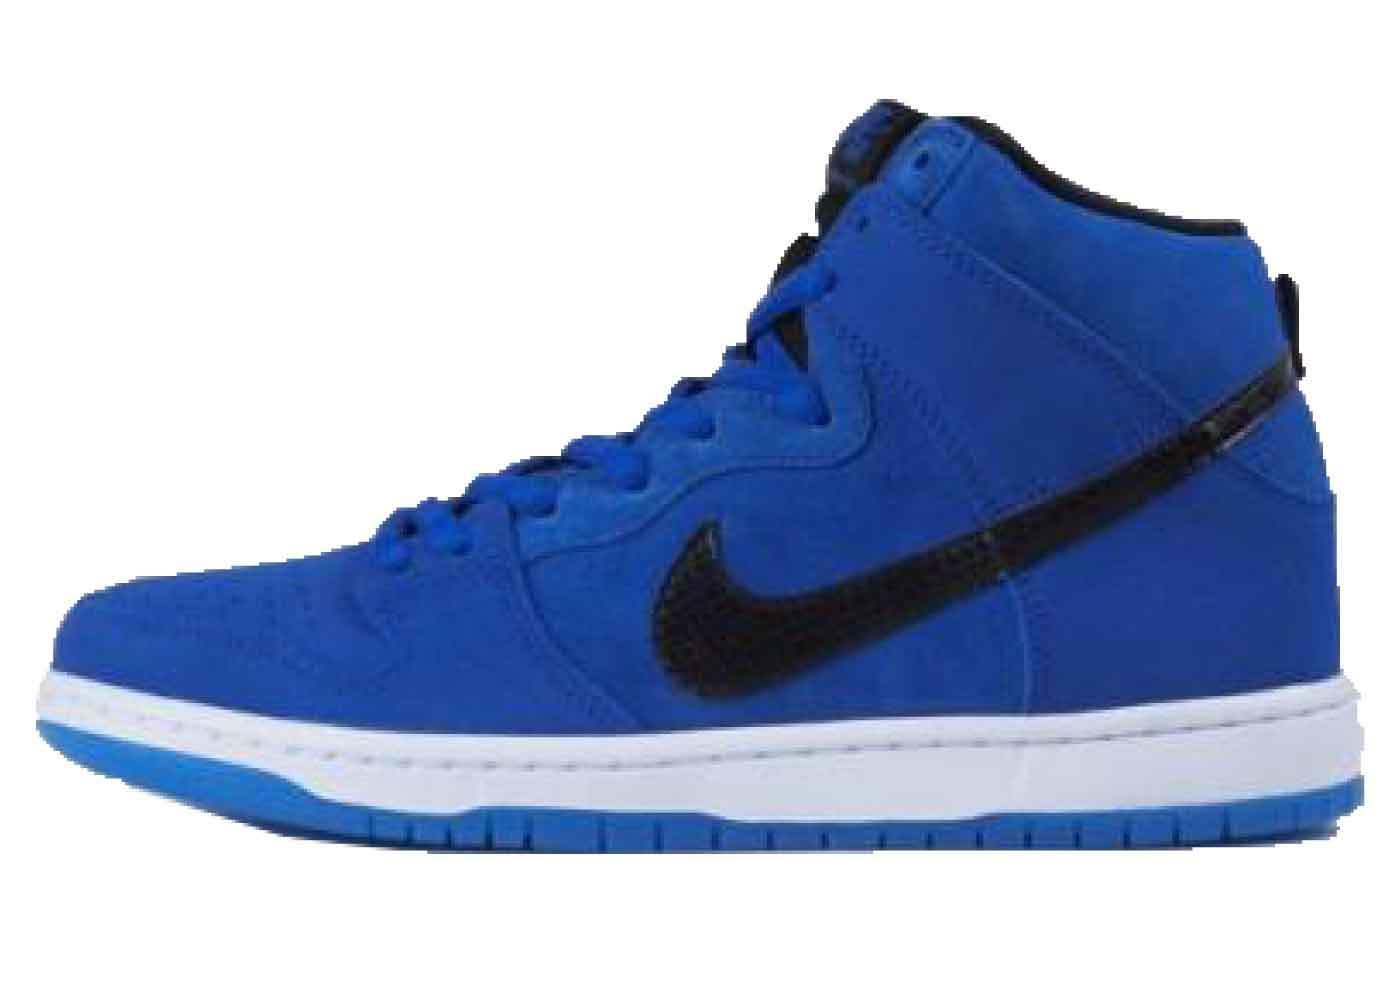 Nike SB Dunk High Game Royal Blackの写真